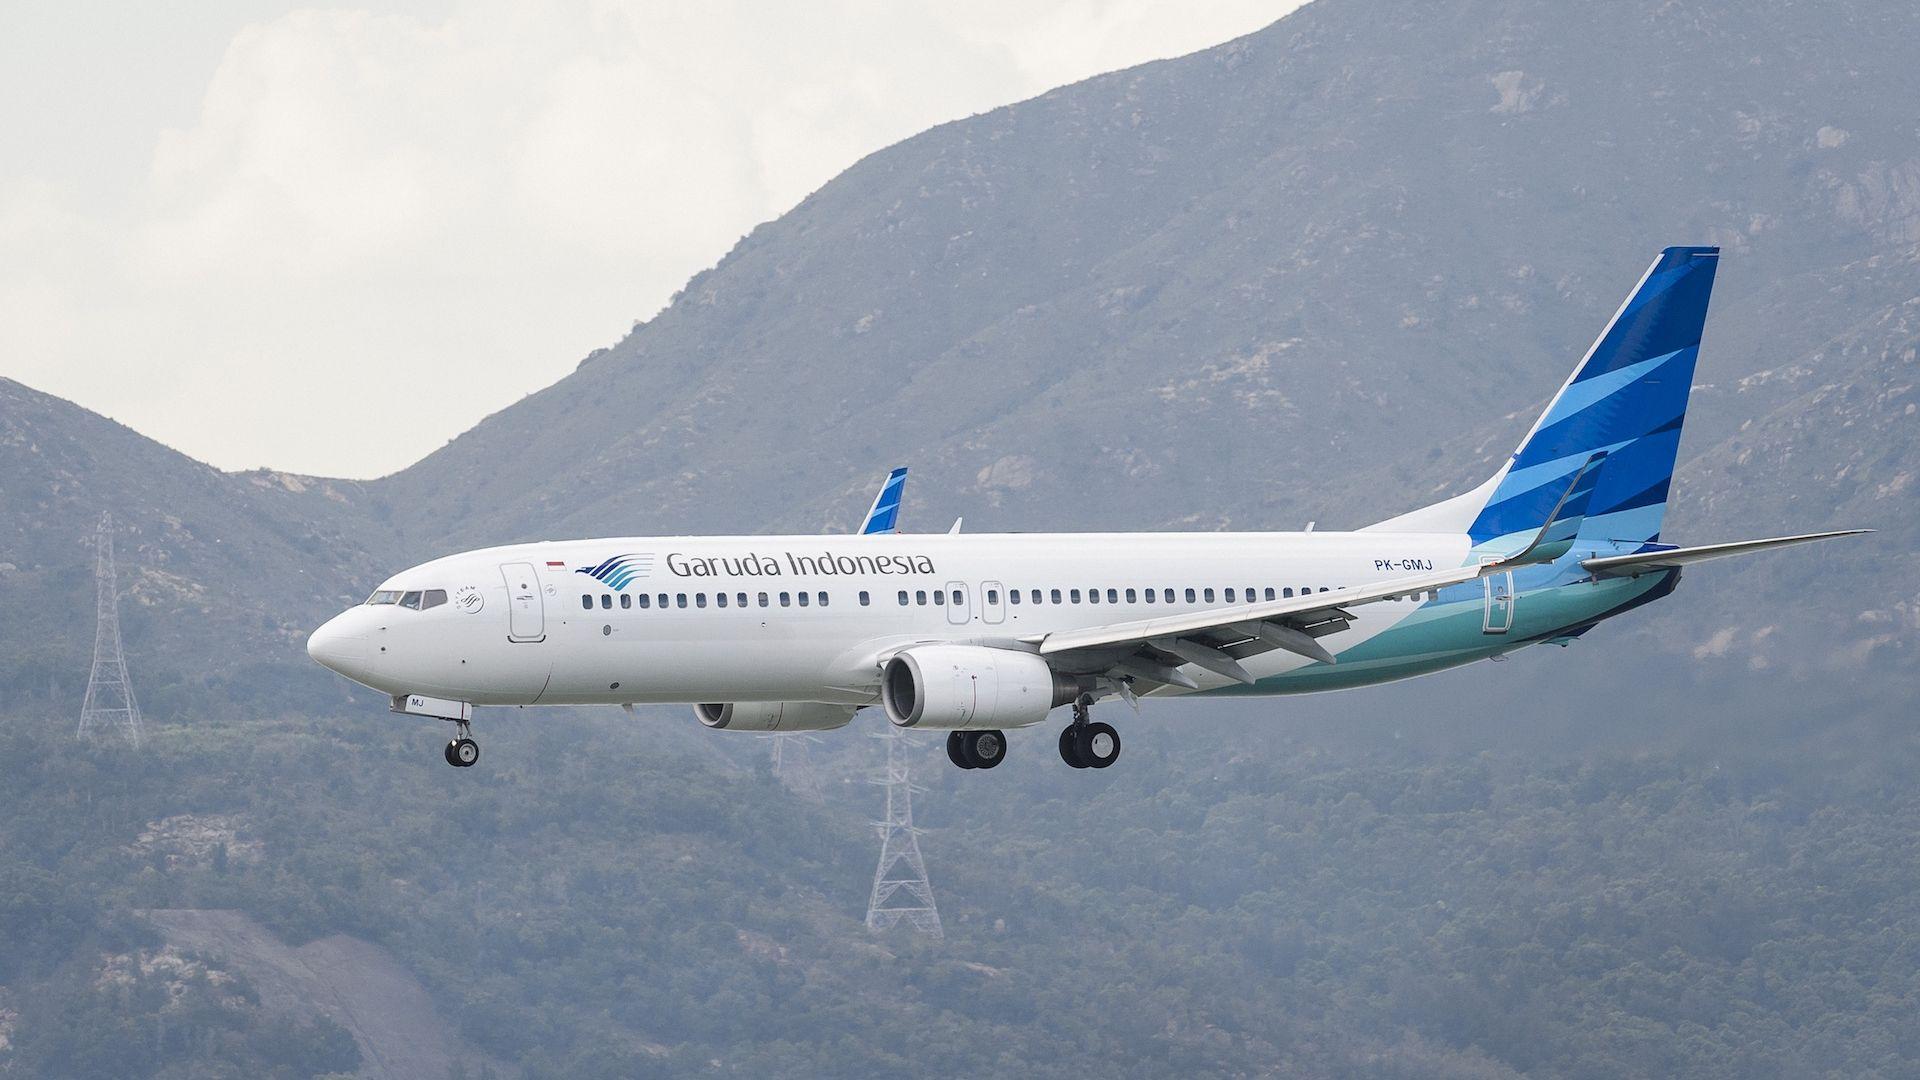 A Garuda Indonesia Boeing 737-800.